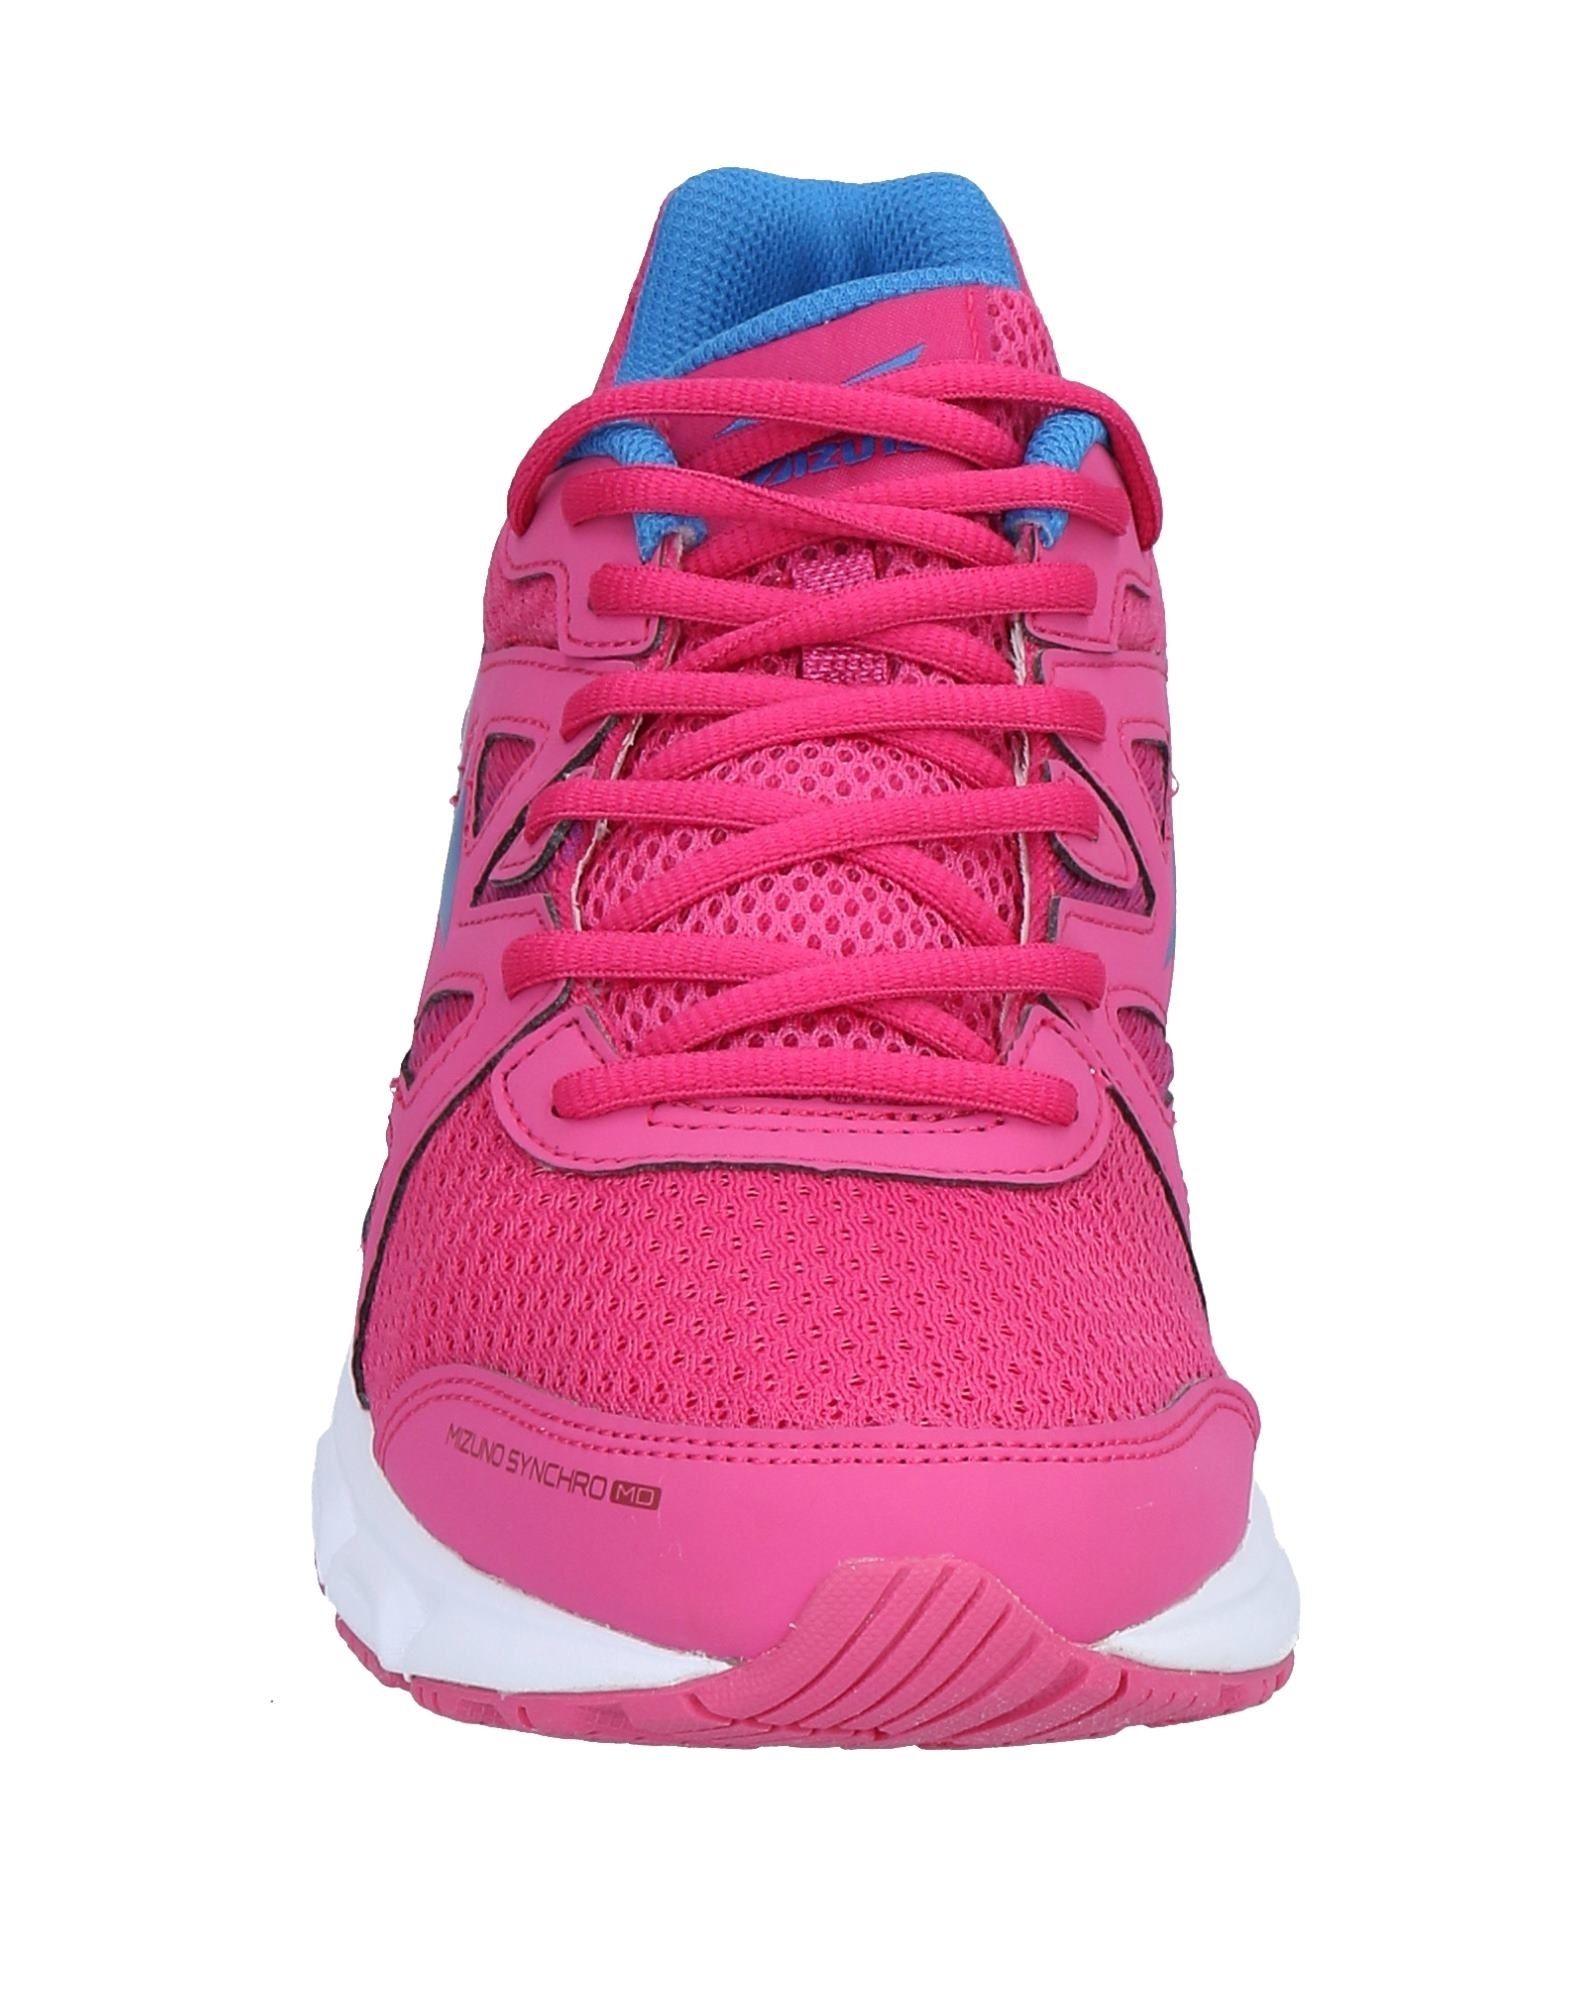 Moda Sneakers Mizuno Donna - 11538045DA 11538045DA - 7d1c5e